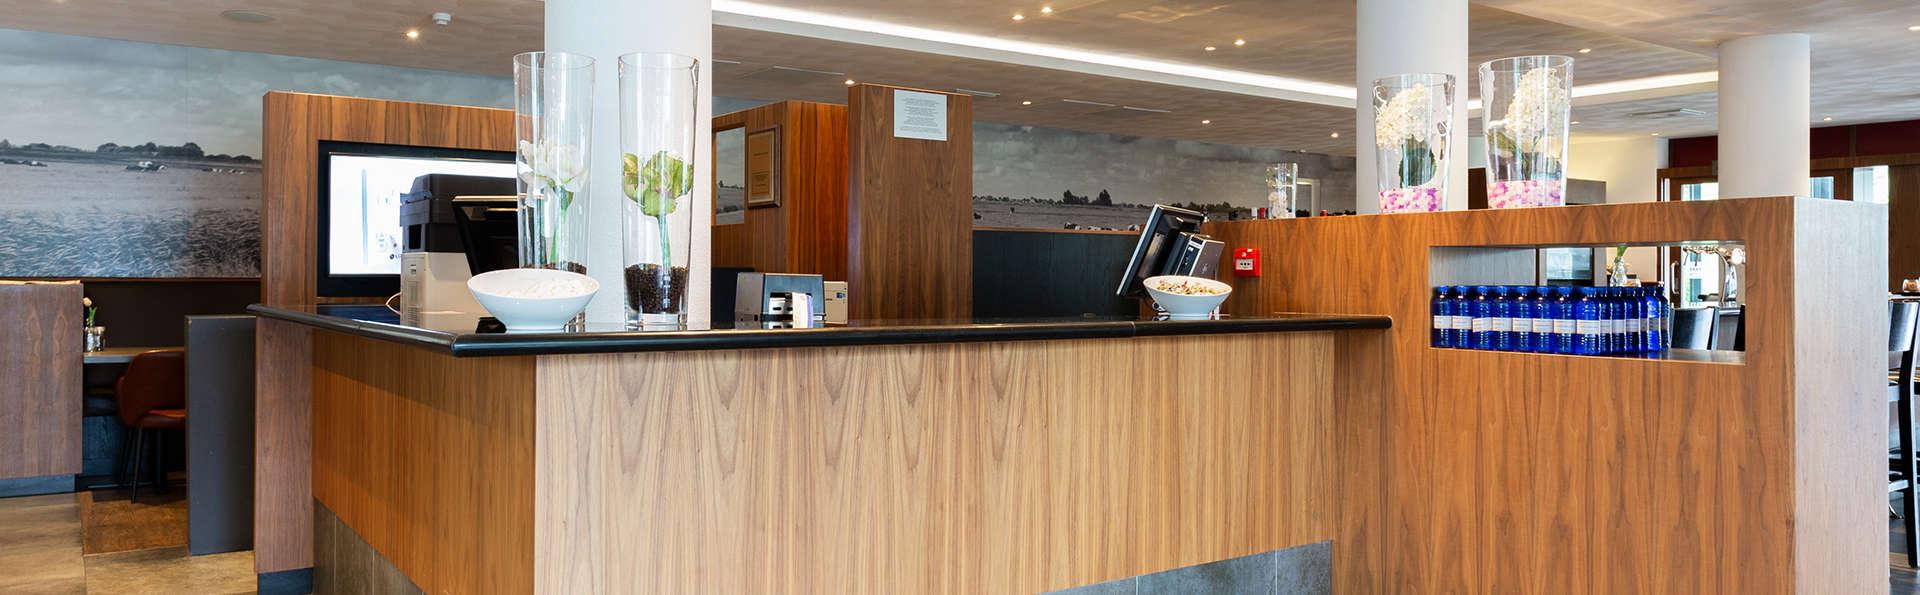 Bastion Hotel Den Haag Rijswijk - EDIT_Receptie.jpg